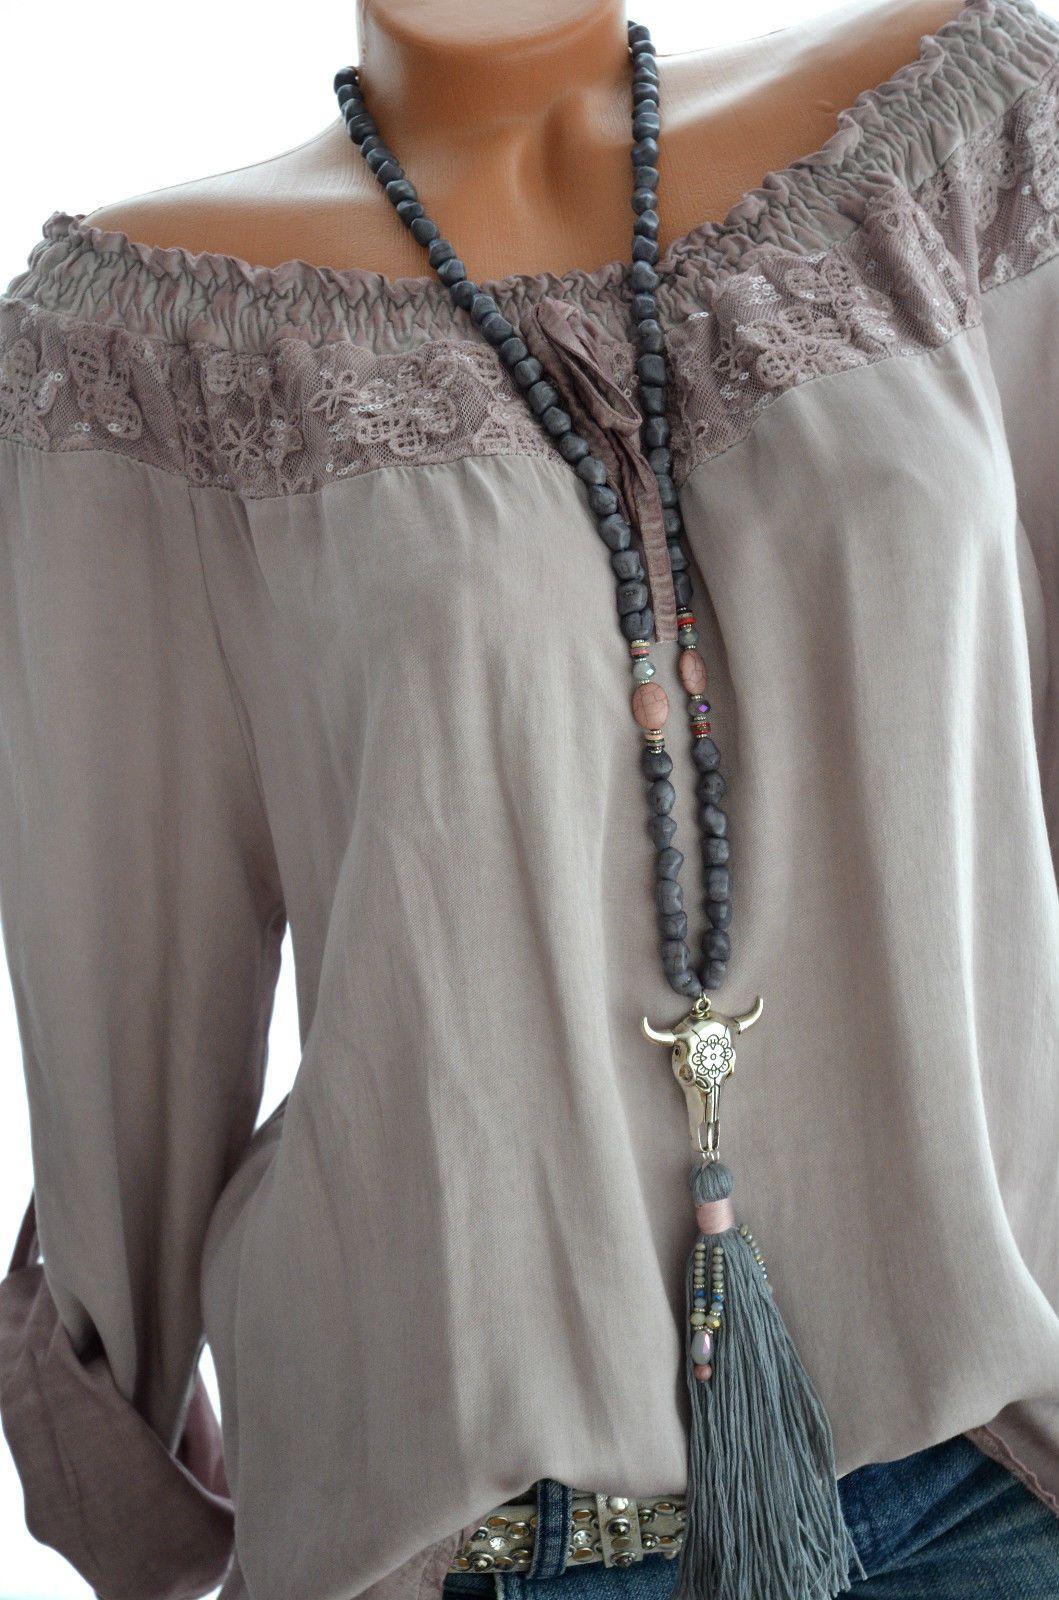 ITALY MODE Carmen Spitze BOHO Tunika Bluse Langarm 36 38 40 42 MAUVE Neu in  Kleidung & Accessoires, Damenmode, Blusen, Tops & Shirts | eBay!